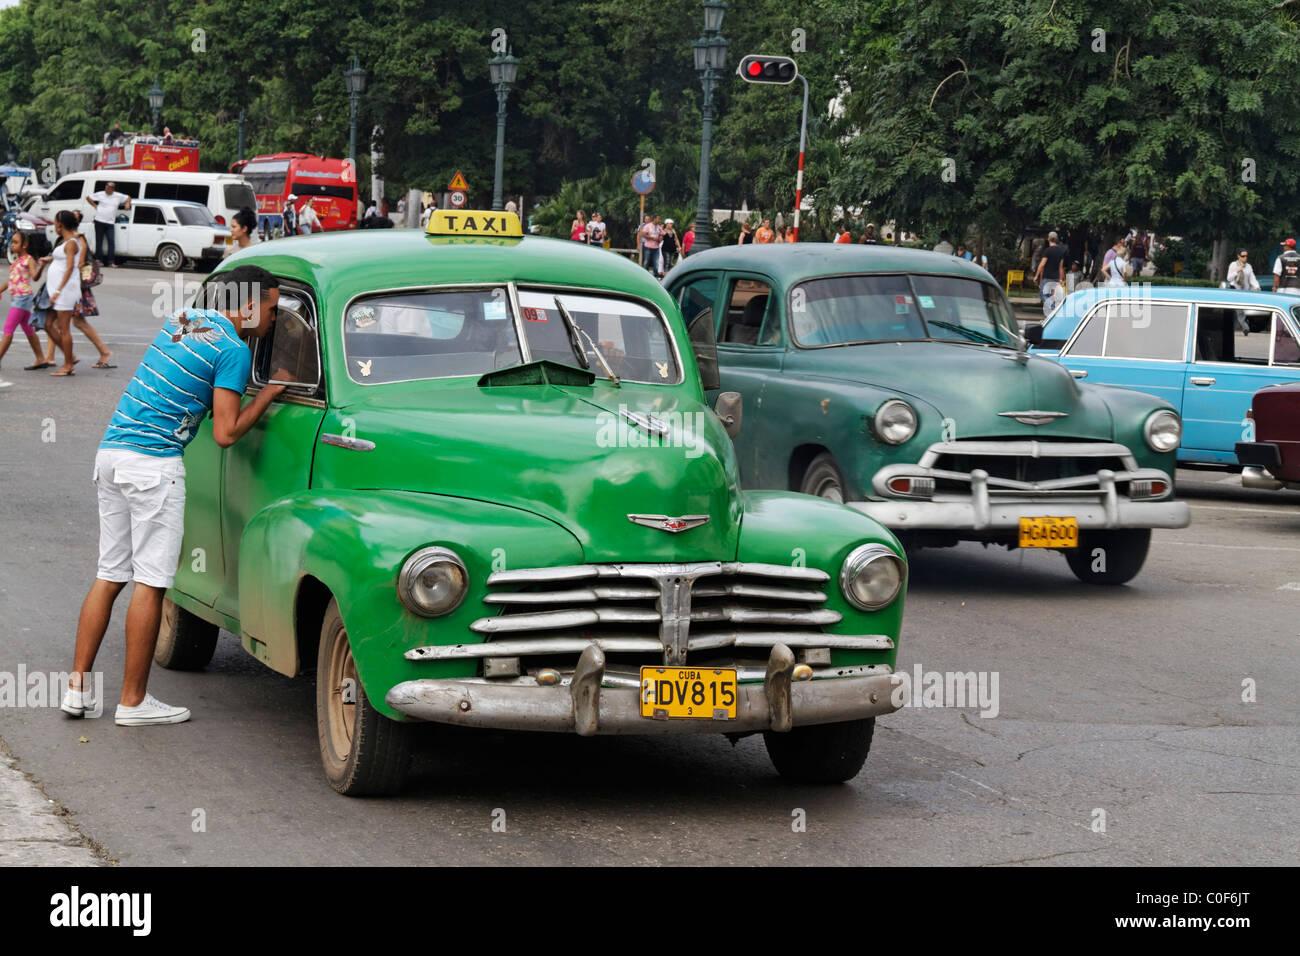 Oldtimer-Taxi in Havanna Zentrum am Paseo de Marti in der Nähe von Capitol, Kuba Stockbild